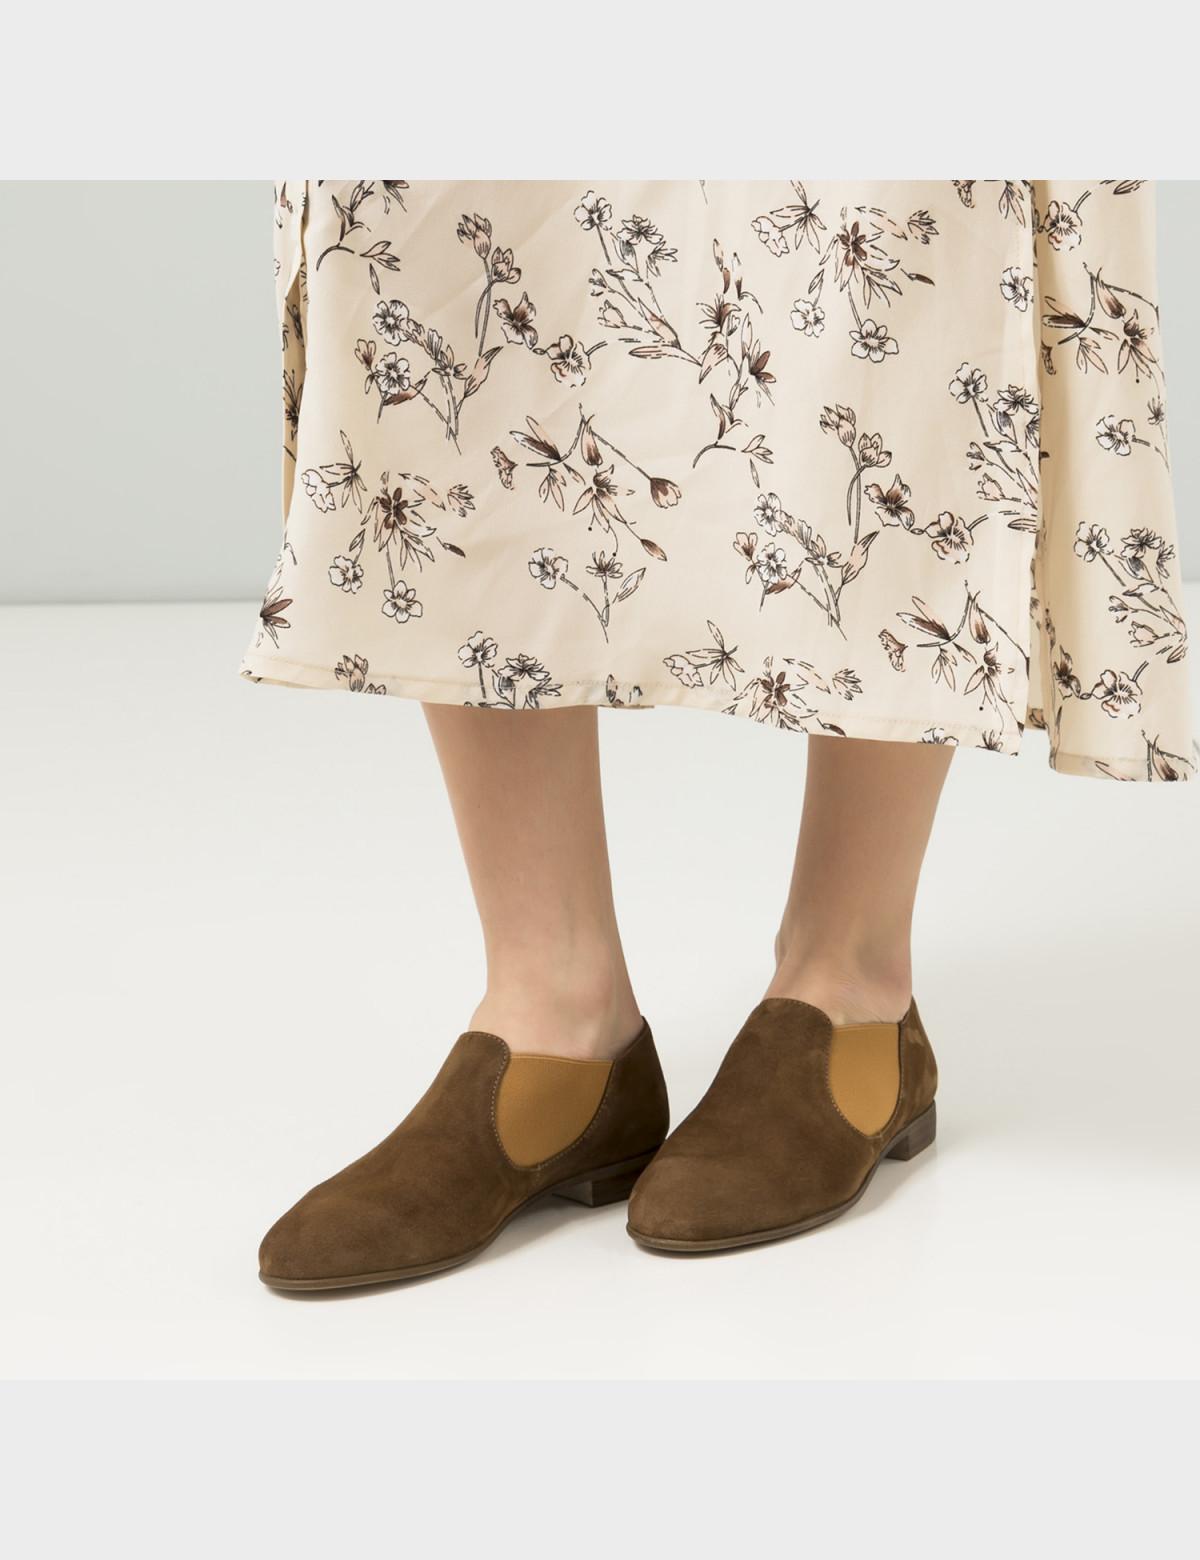 Туфли бежевые, натуральная замша5